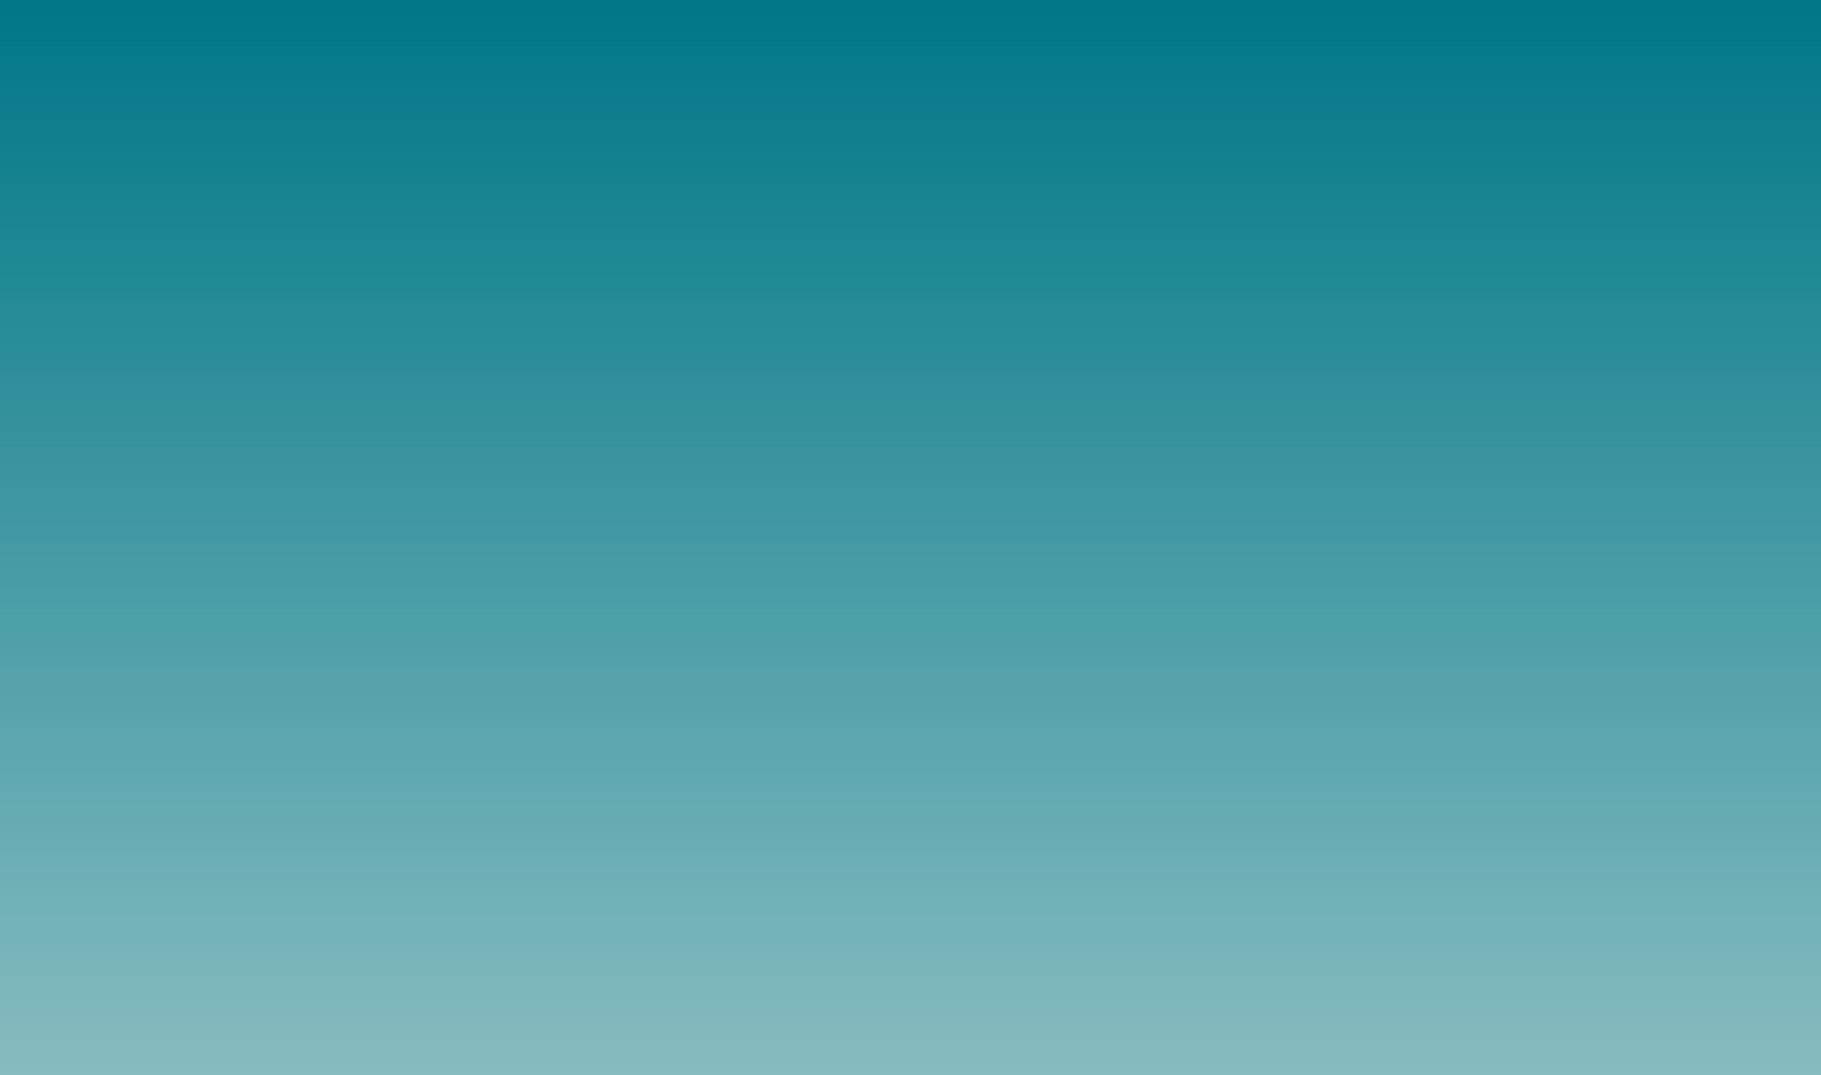 CPPI_digital_Exports_RVB-26.png